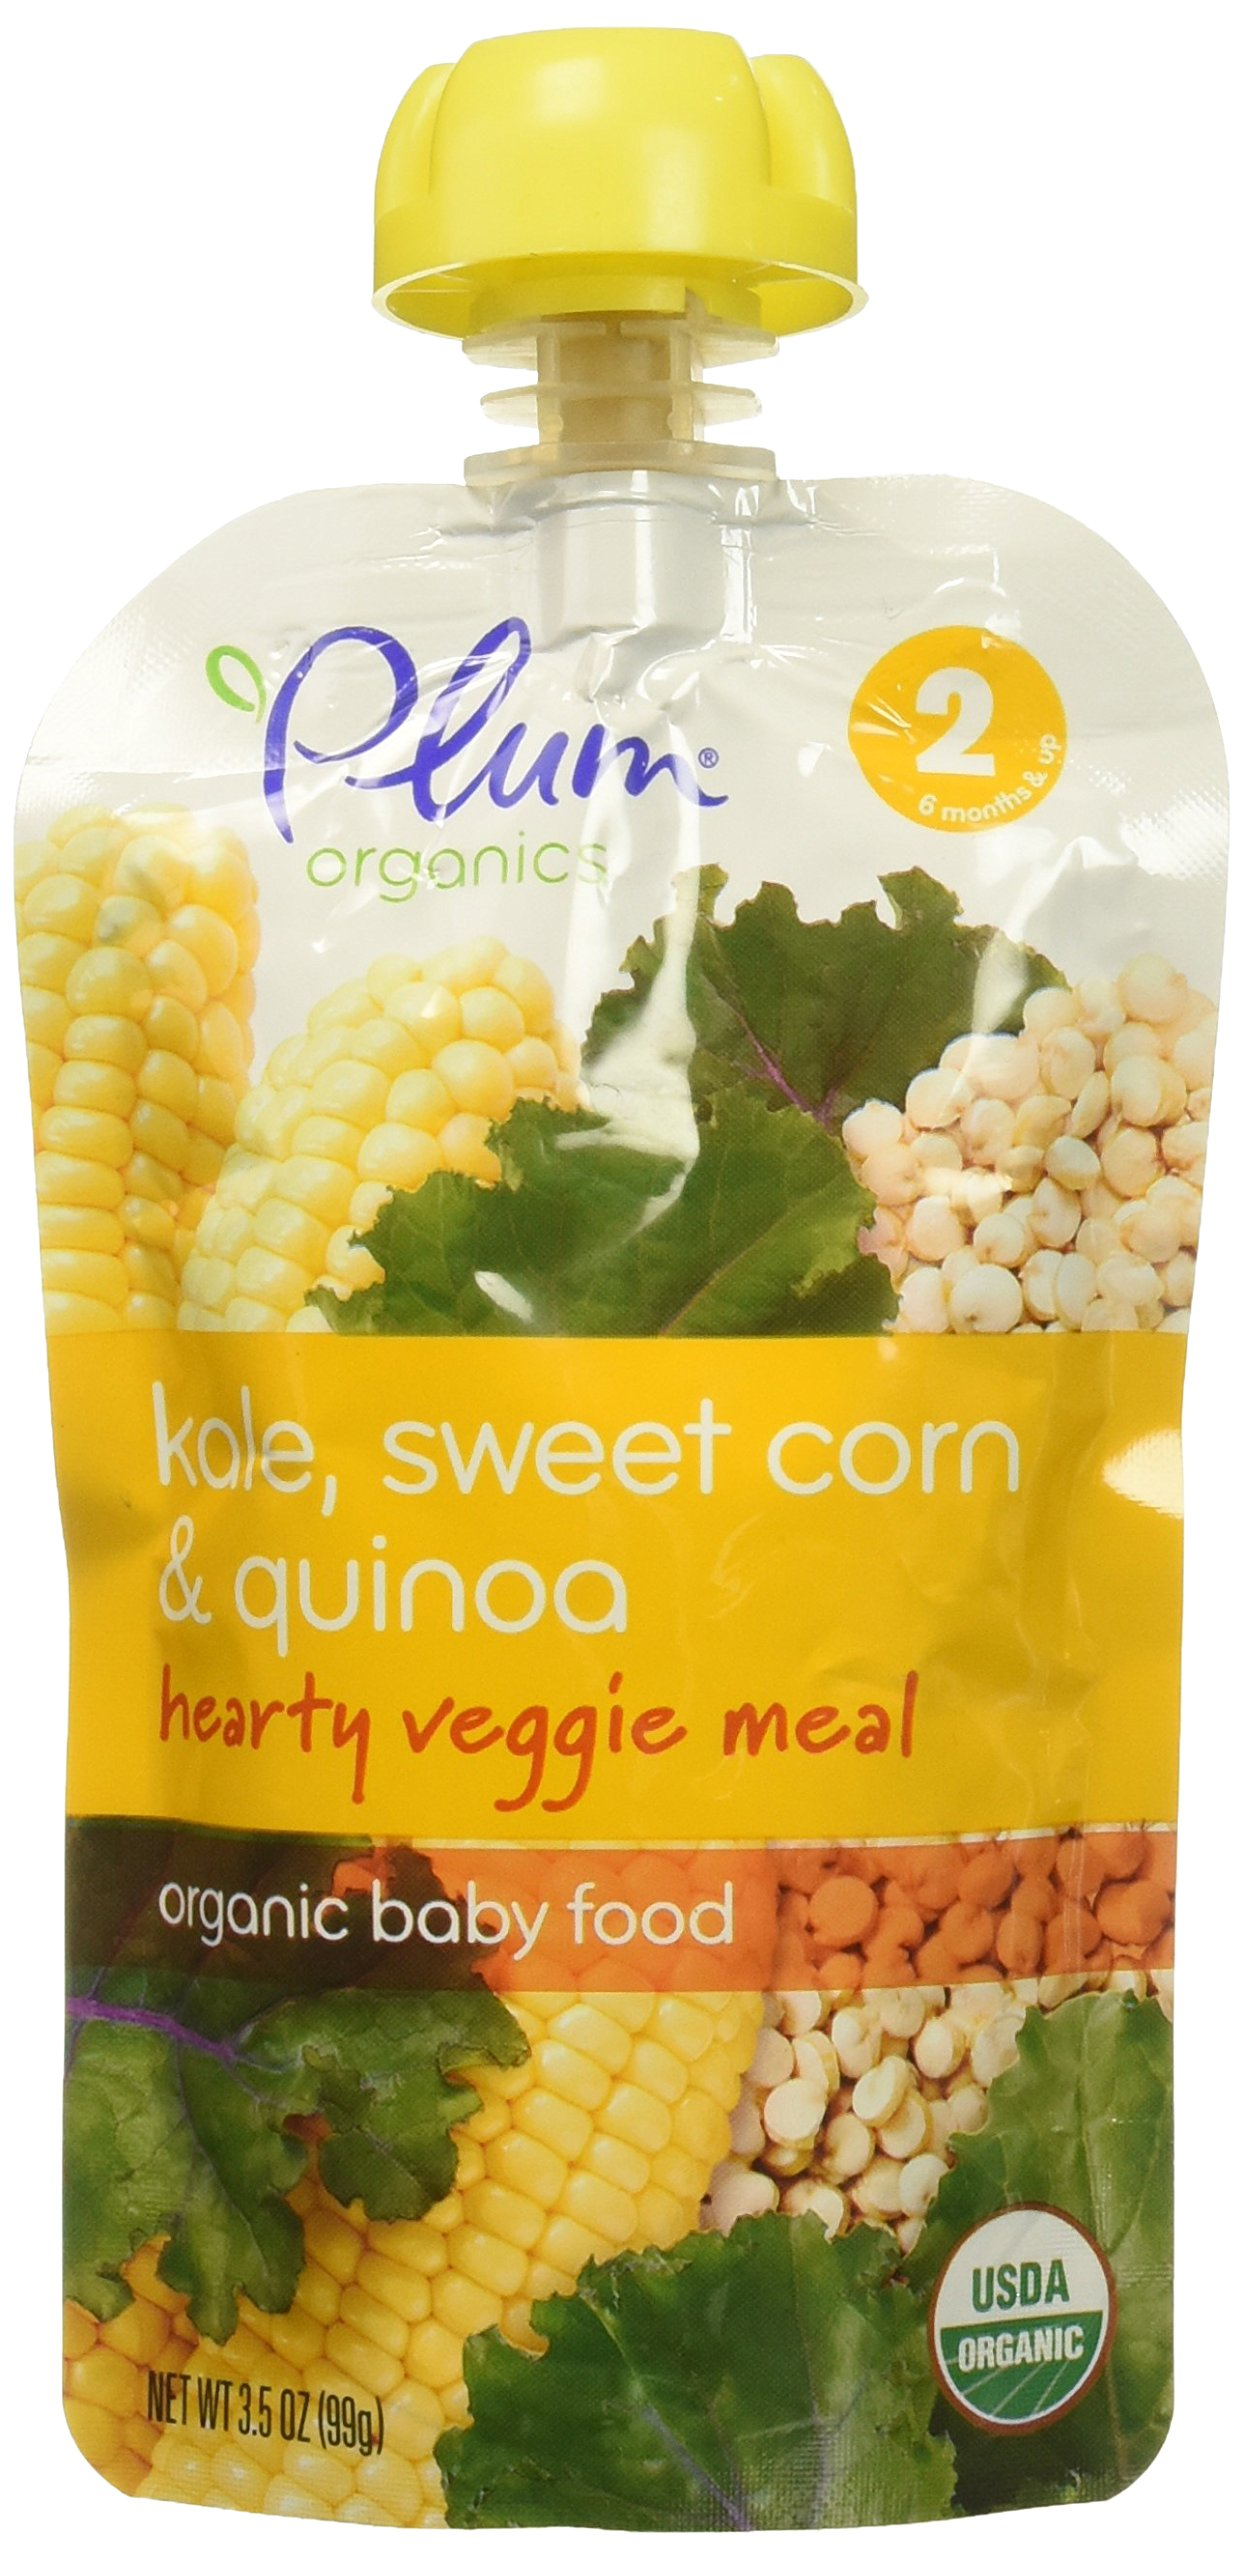 Plum Organics Corn, Kale, Carrot & Tomato Baby Food, 3.5 oz